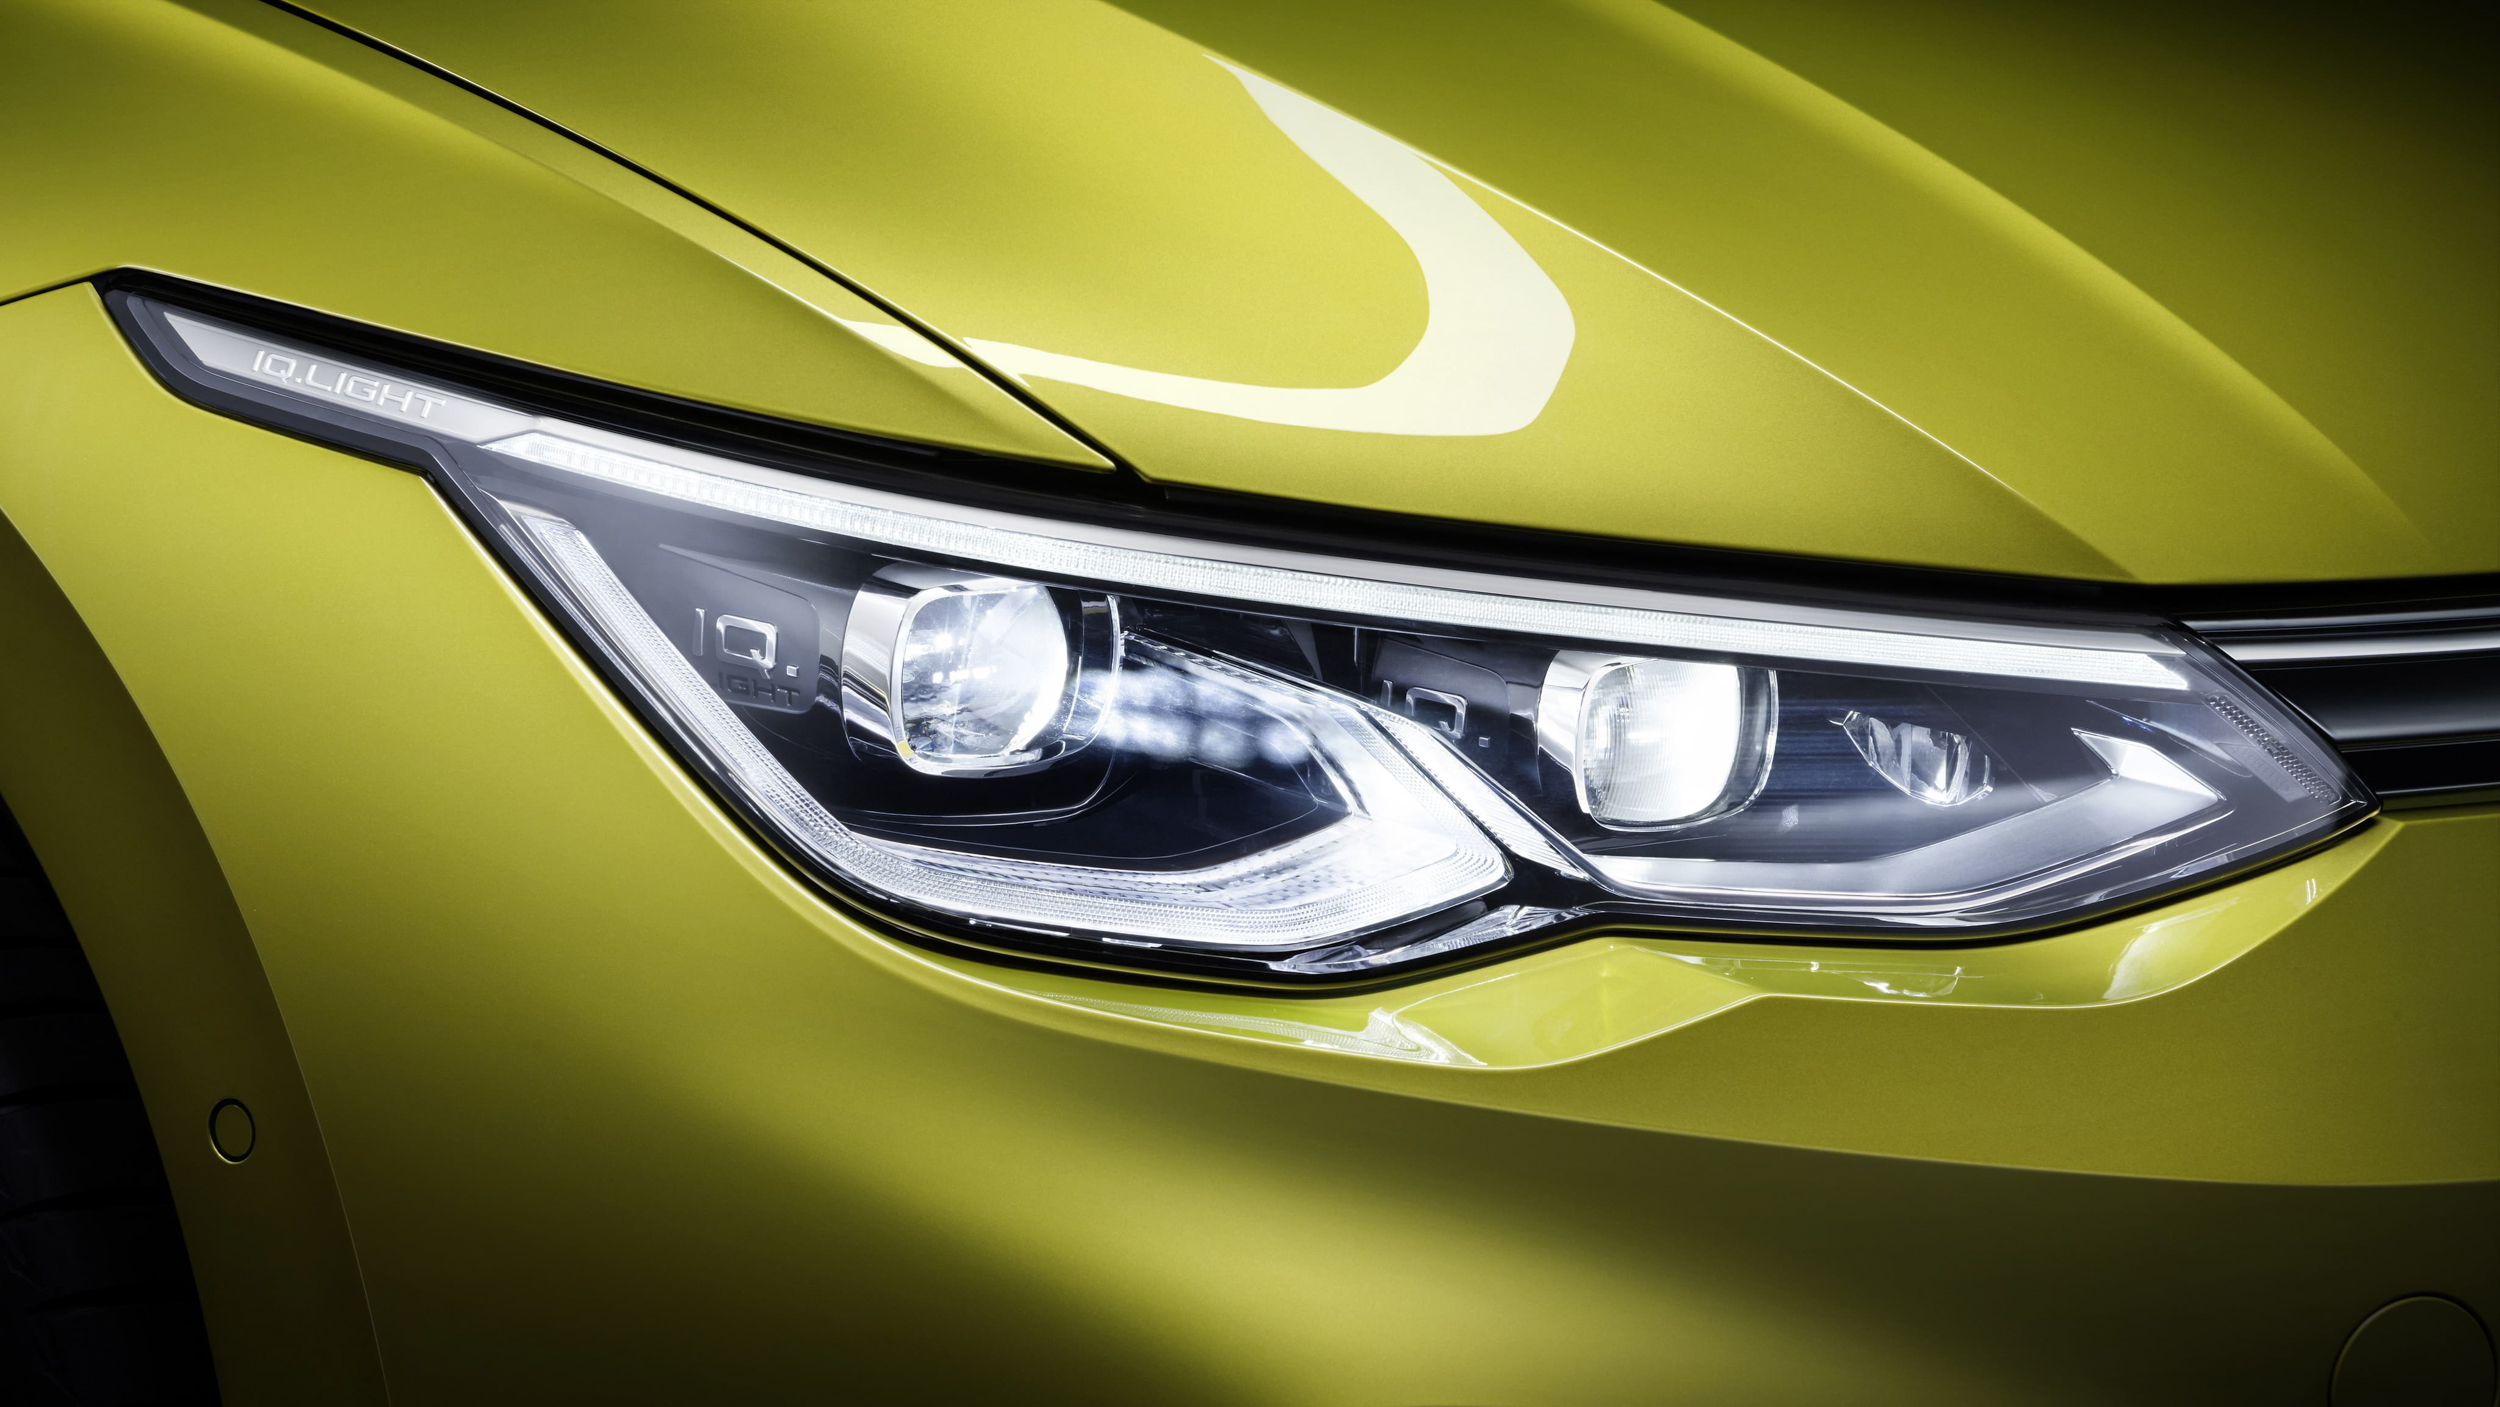 搭載全LED科技的IQ.LIGHT智慧燈組,包含光感應自動頭燈(含Coming Home和Leaving Home功能)。